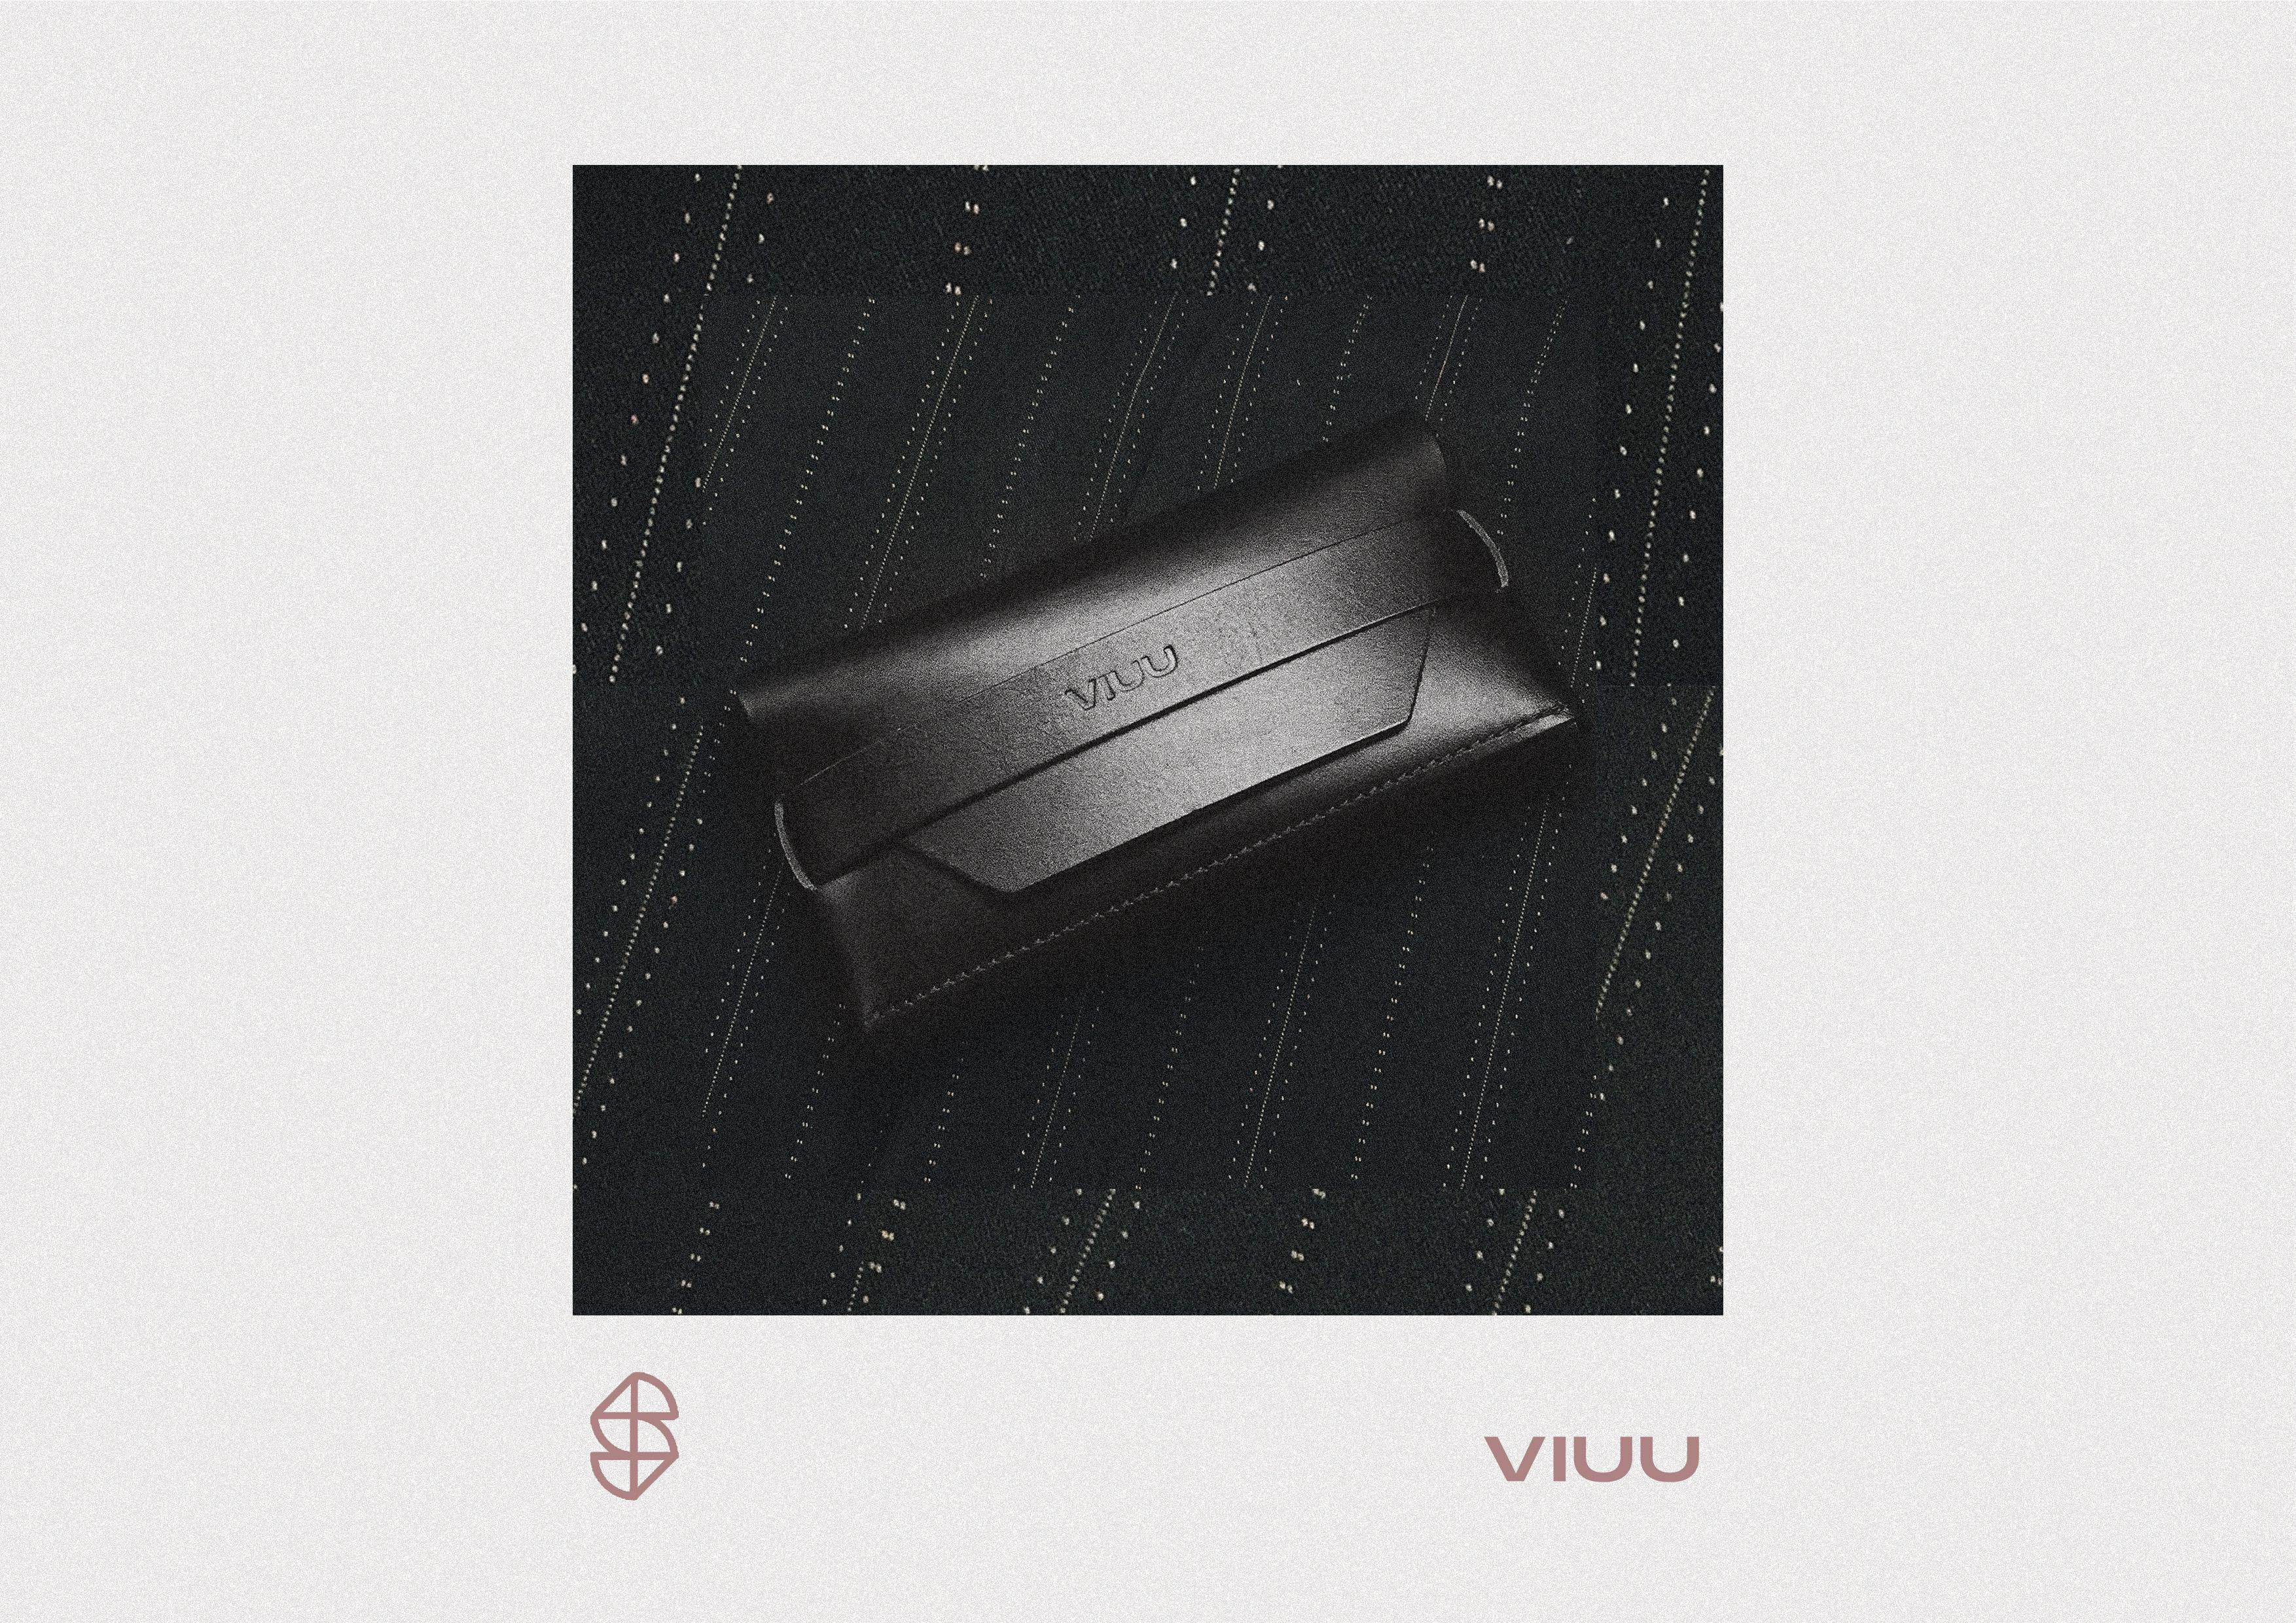 VIUU leather eyewear cases